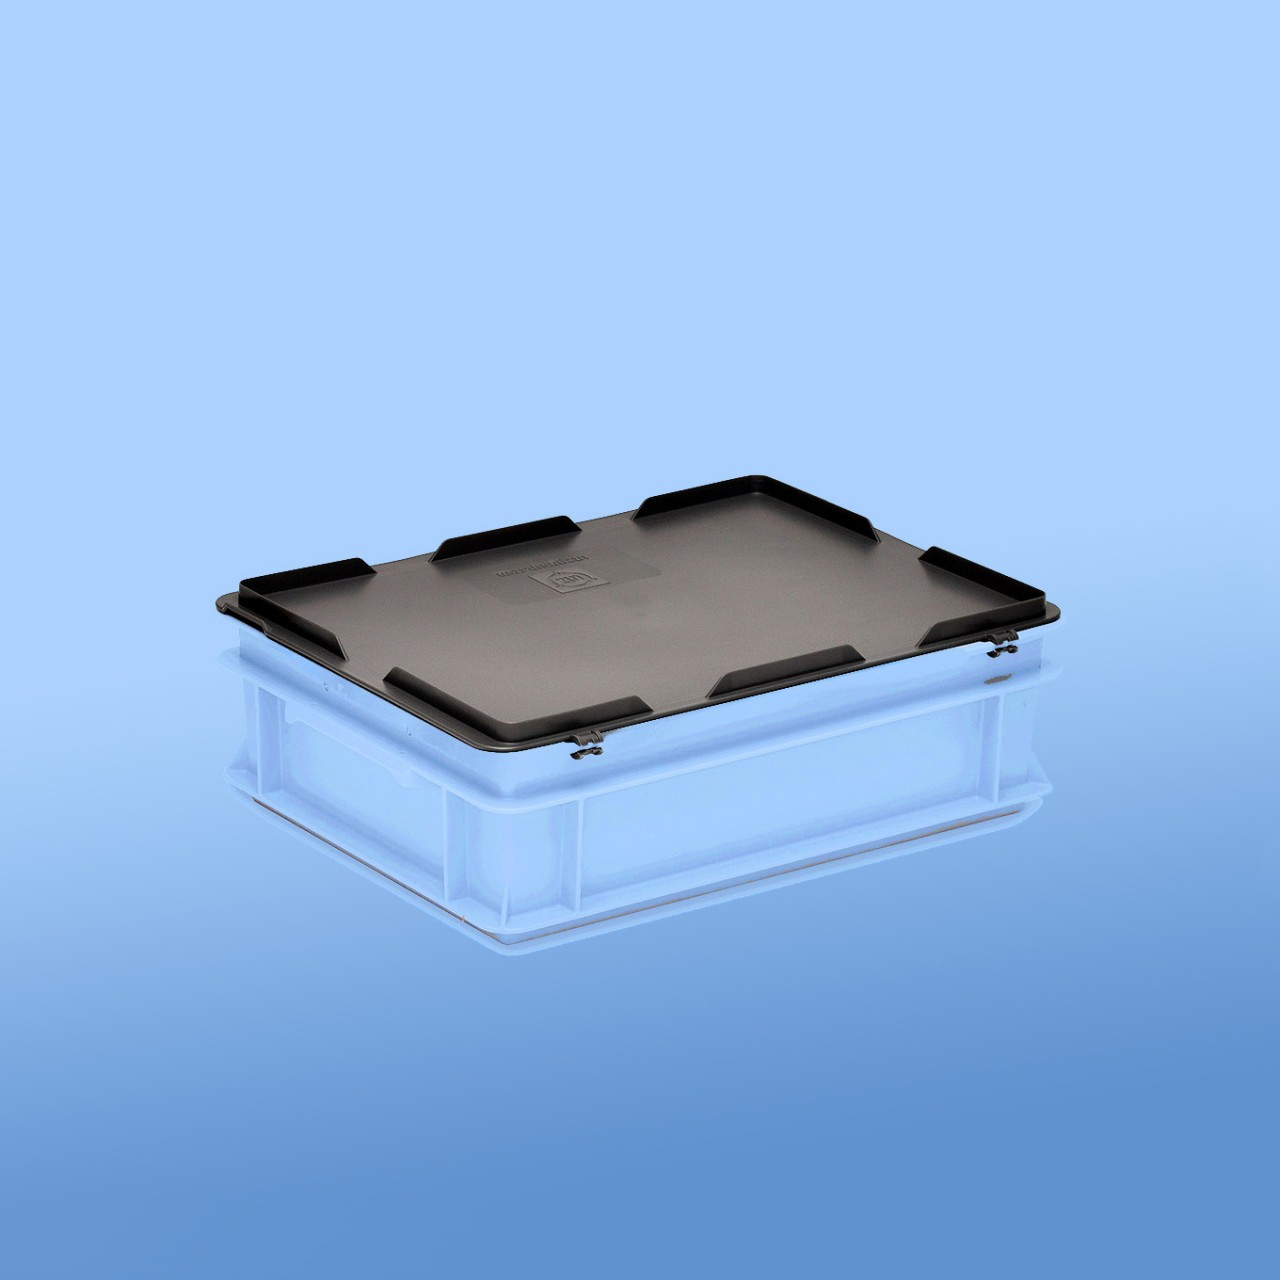 Deckel zu Rako-Behälter |400 x 300 mm